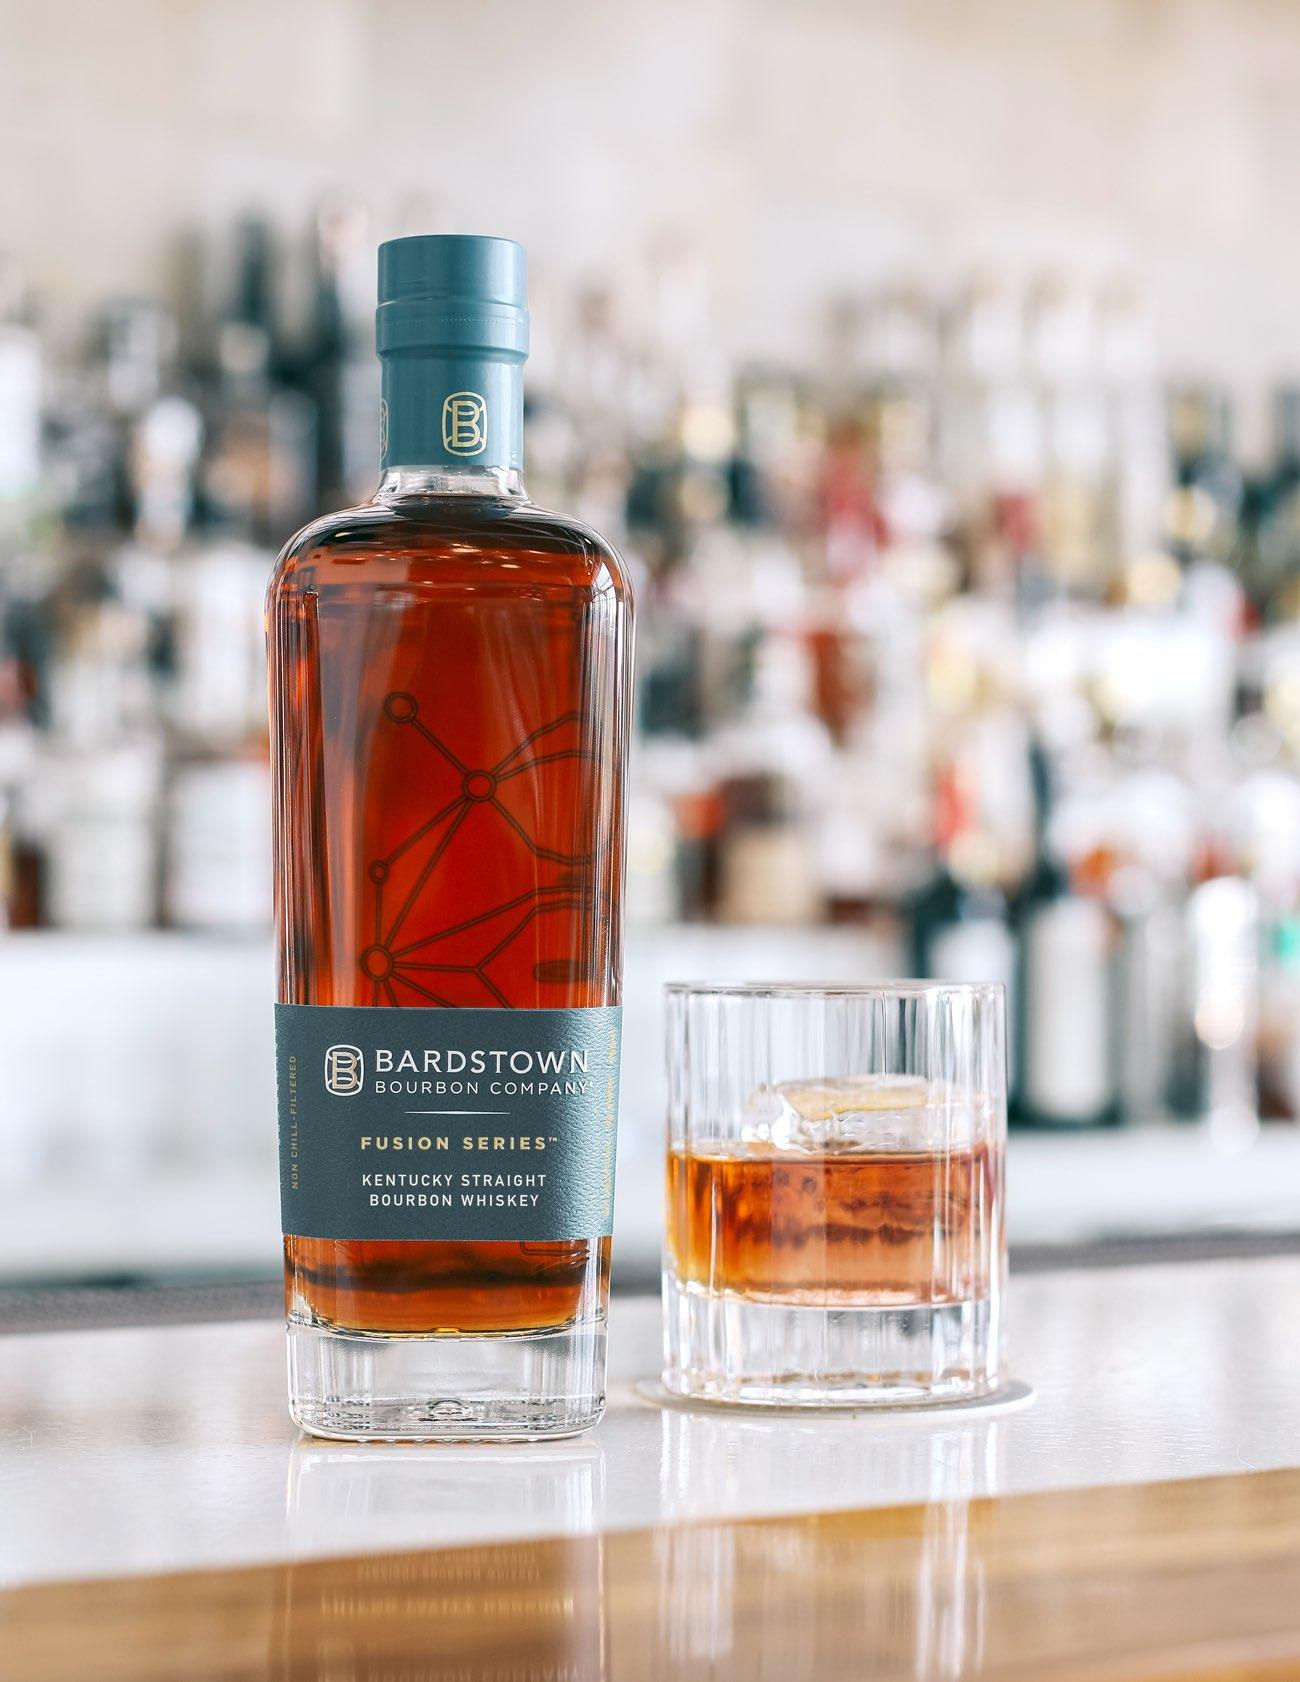 Bardstown Bourbon Fusion Series1